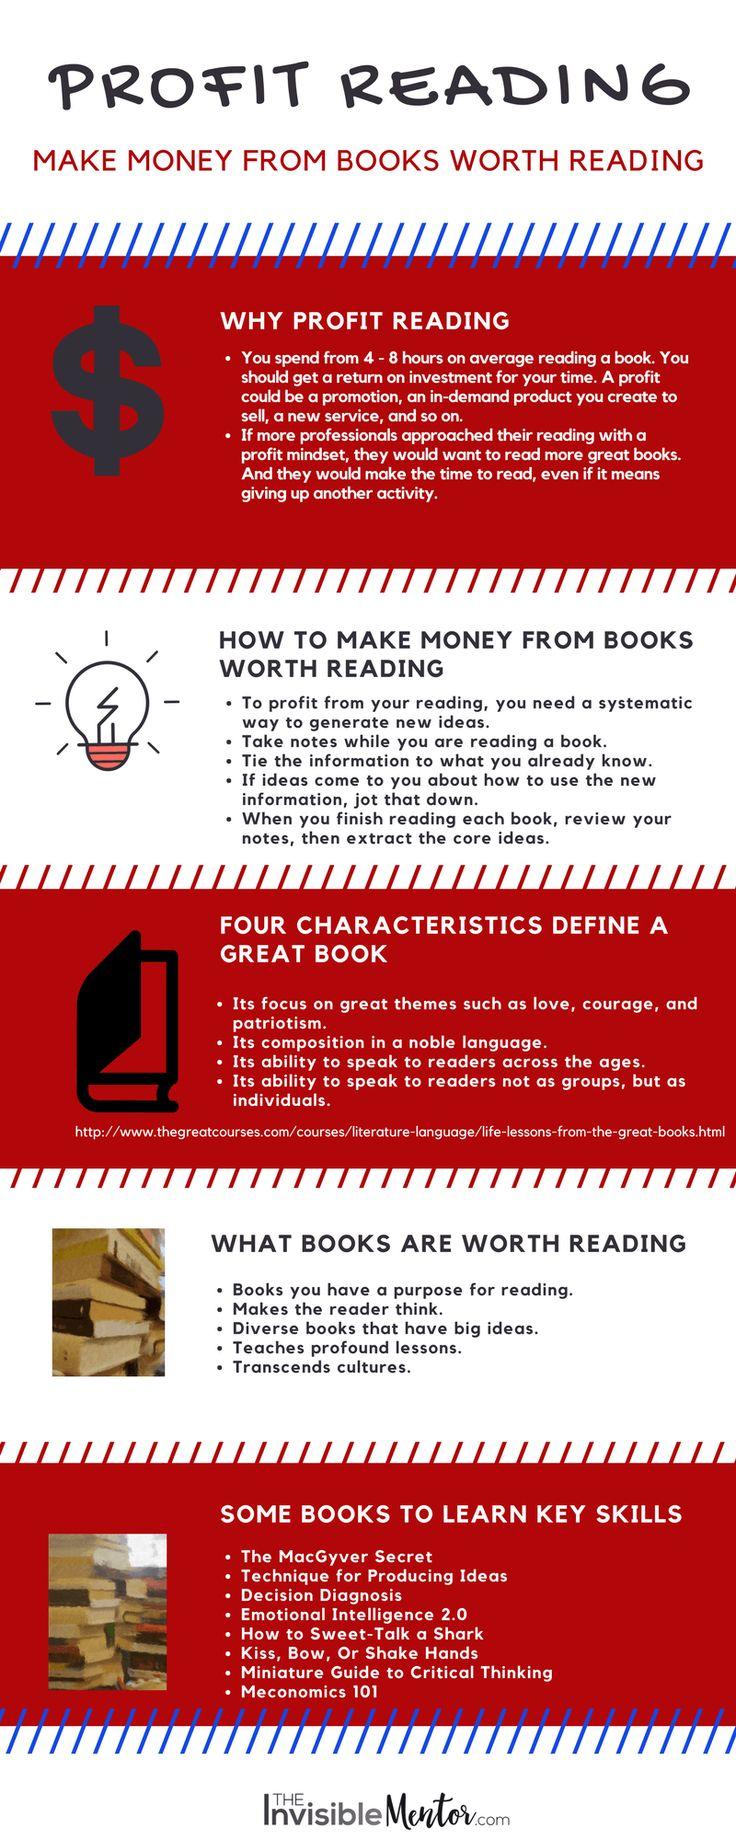 Profit Reading: Make Money From Books Worth Reading